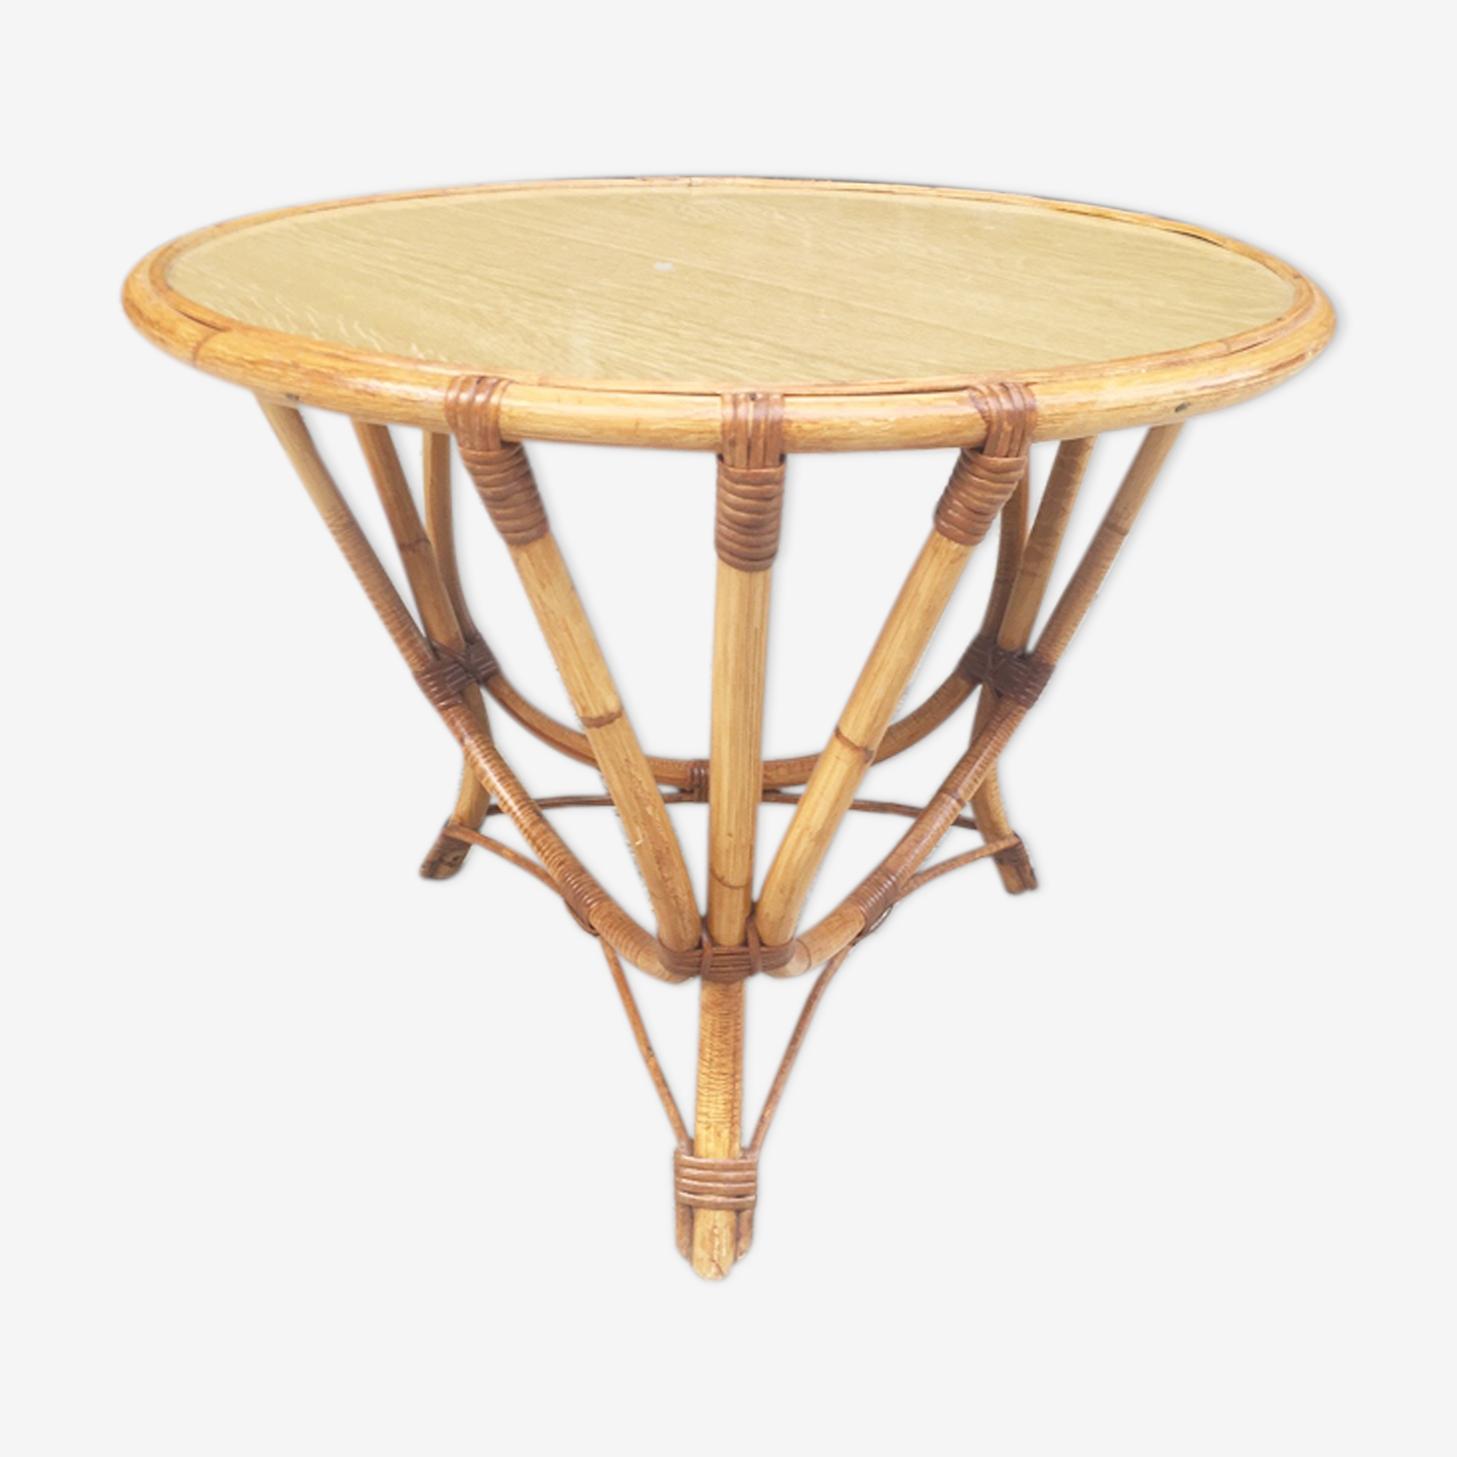 Table basse tripode en rotin des années 60